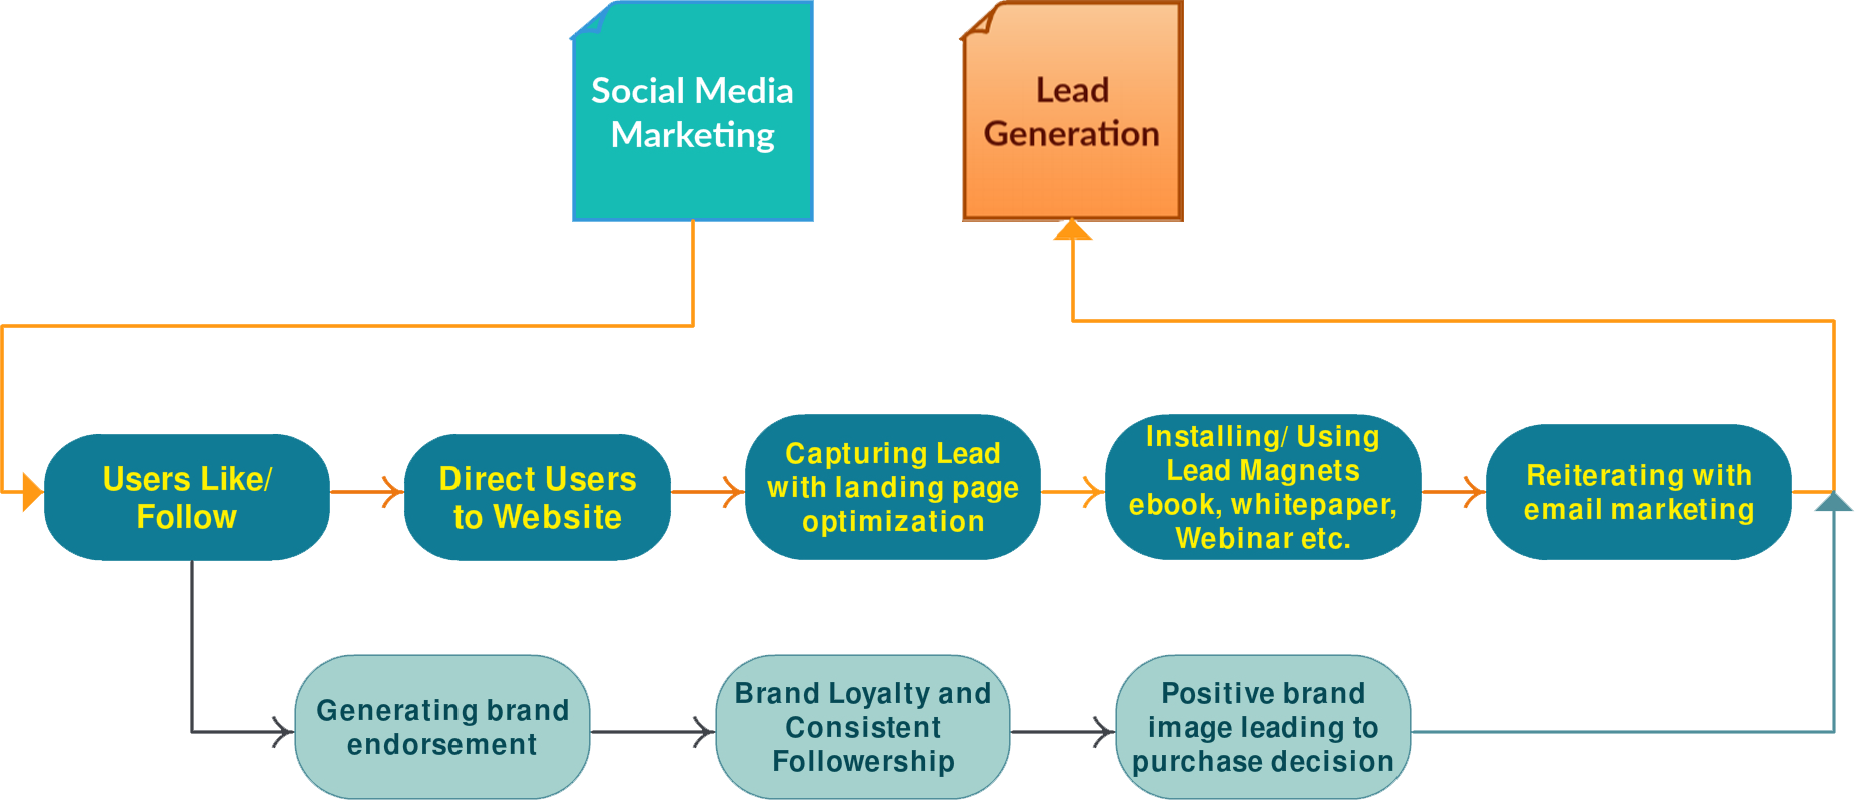 Top 3 Digital Marketing Strategies for Lead Generation in 2018